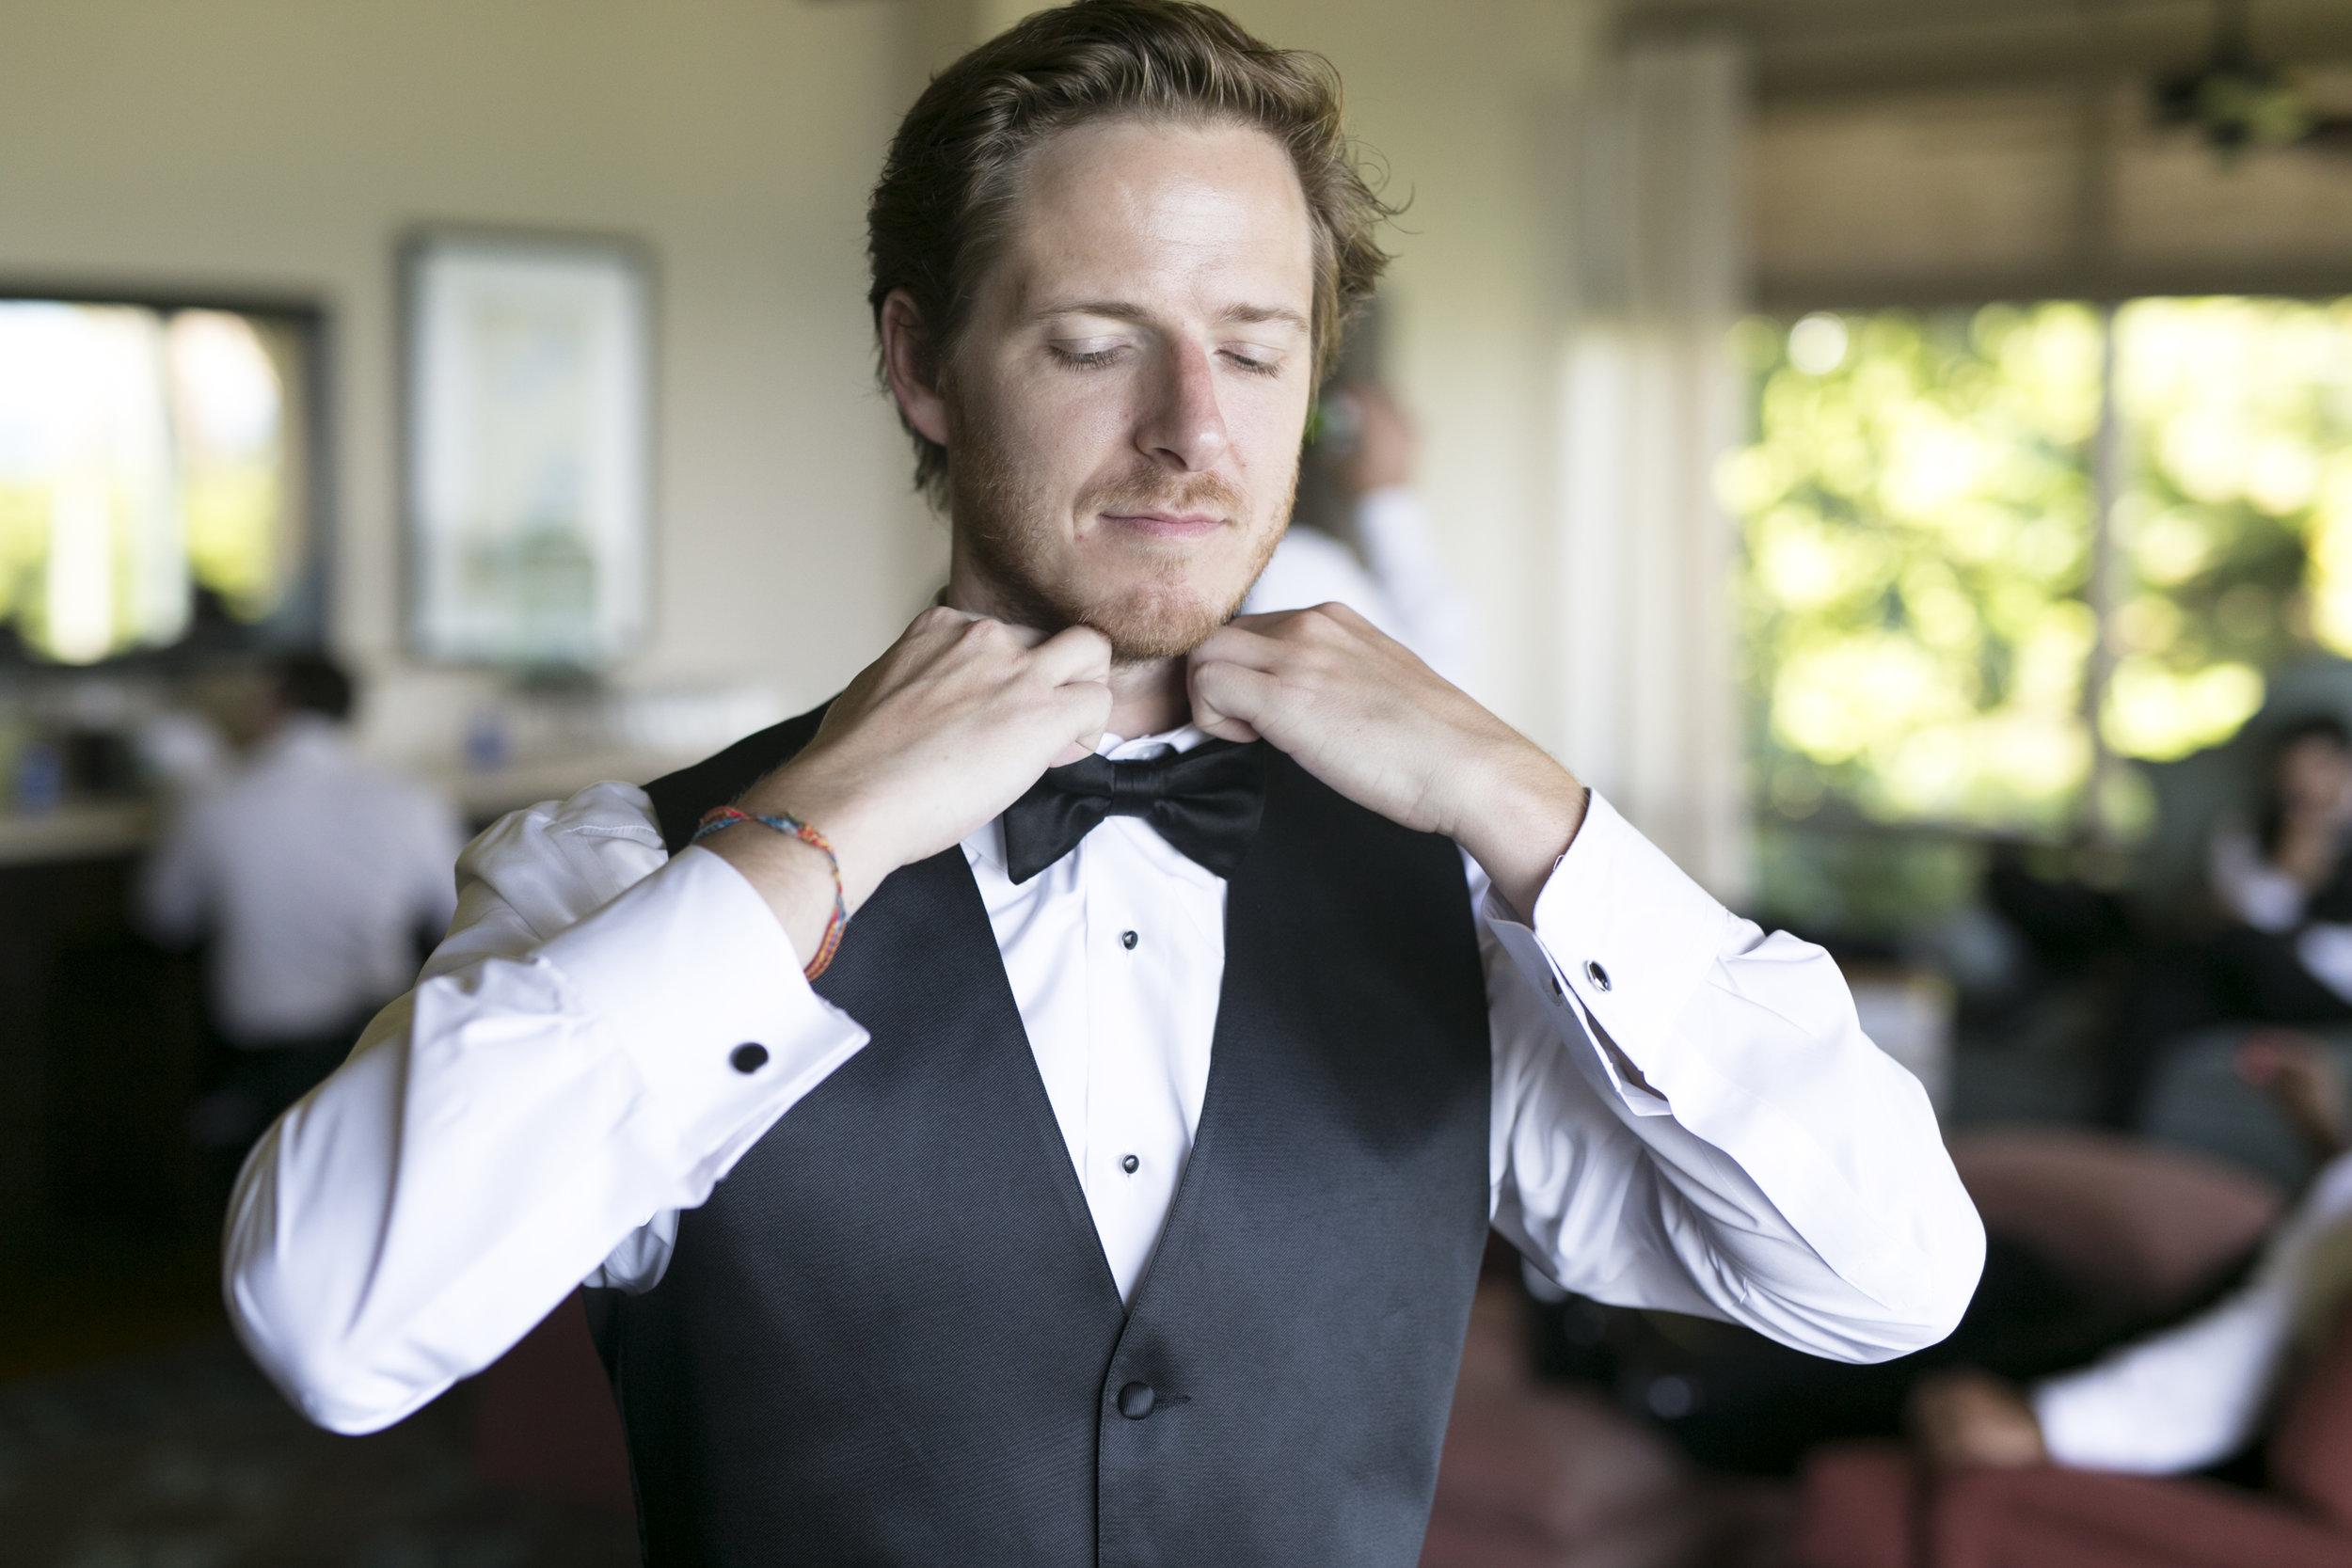 Groom Photos - A Romantic Bel Air Bay Club Ocean-View Wedding - Southern California Wedding - Kevin Dinh Photography